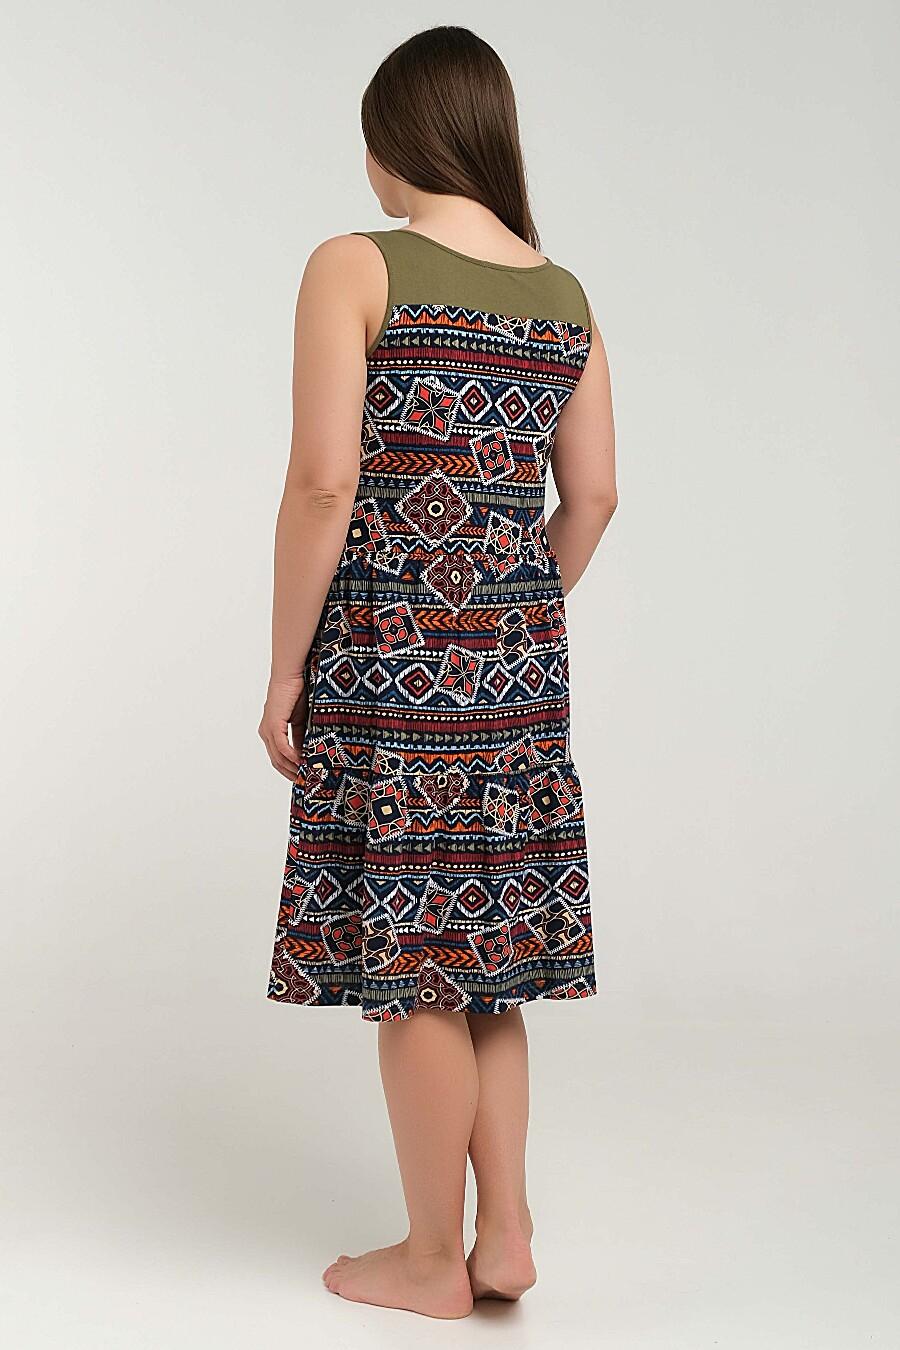 Сарафан ODEVAITE (665982), купить в Moyo.moda